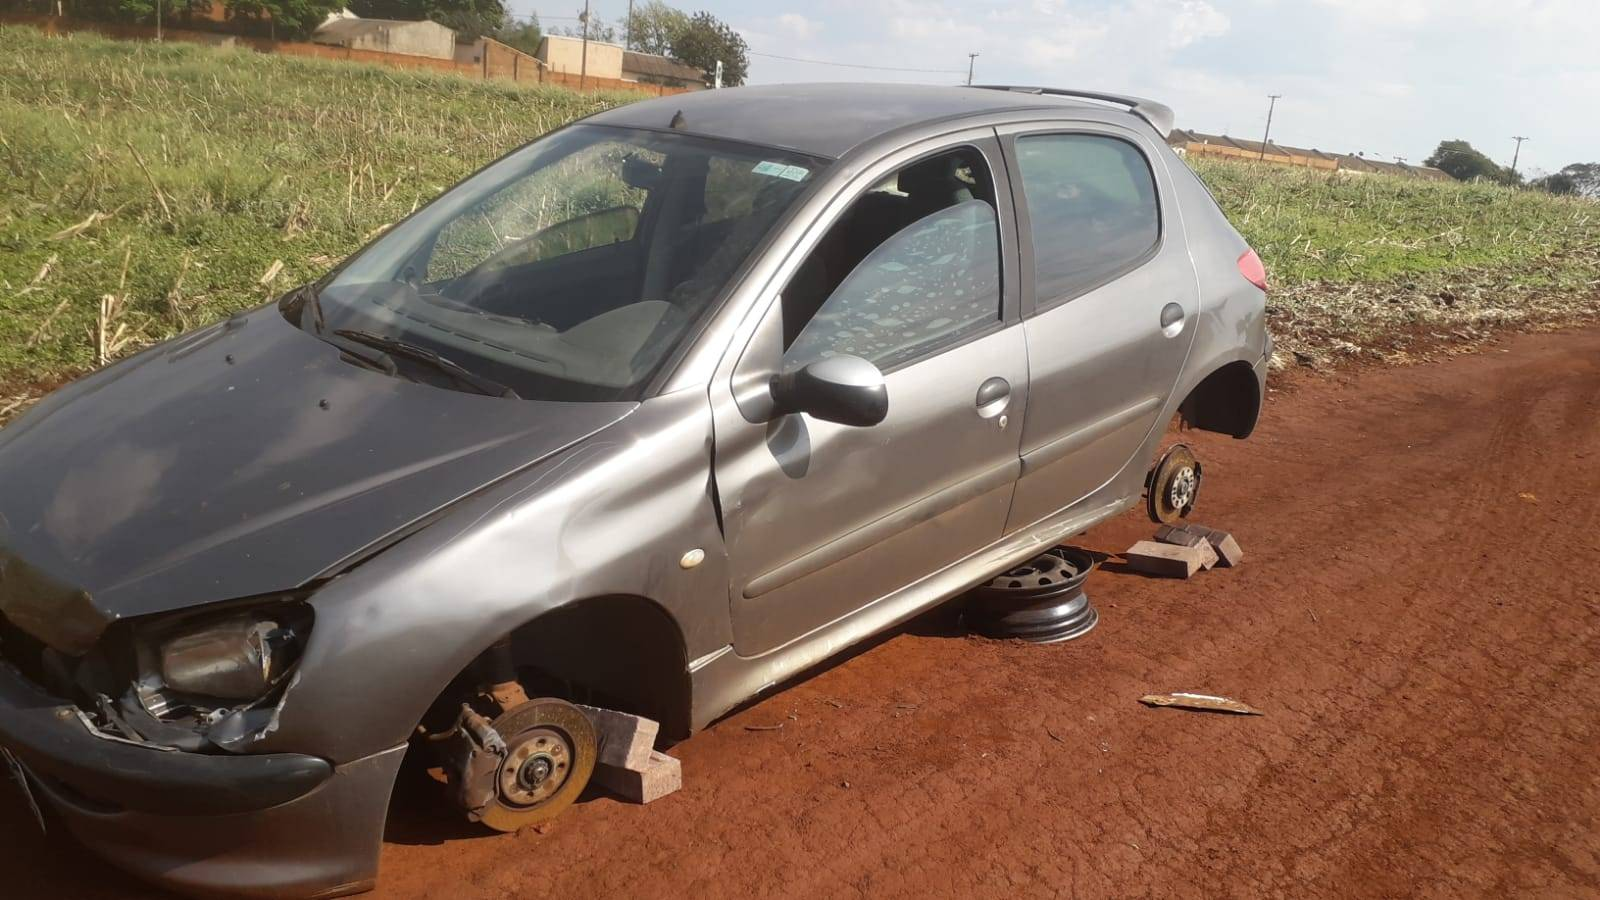 Polícia Militar de Cascavel recupera Peugeot 206 furtado em Toledo